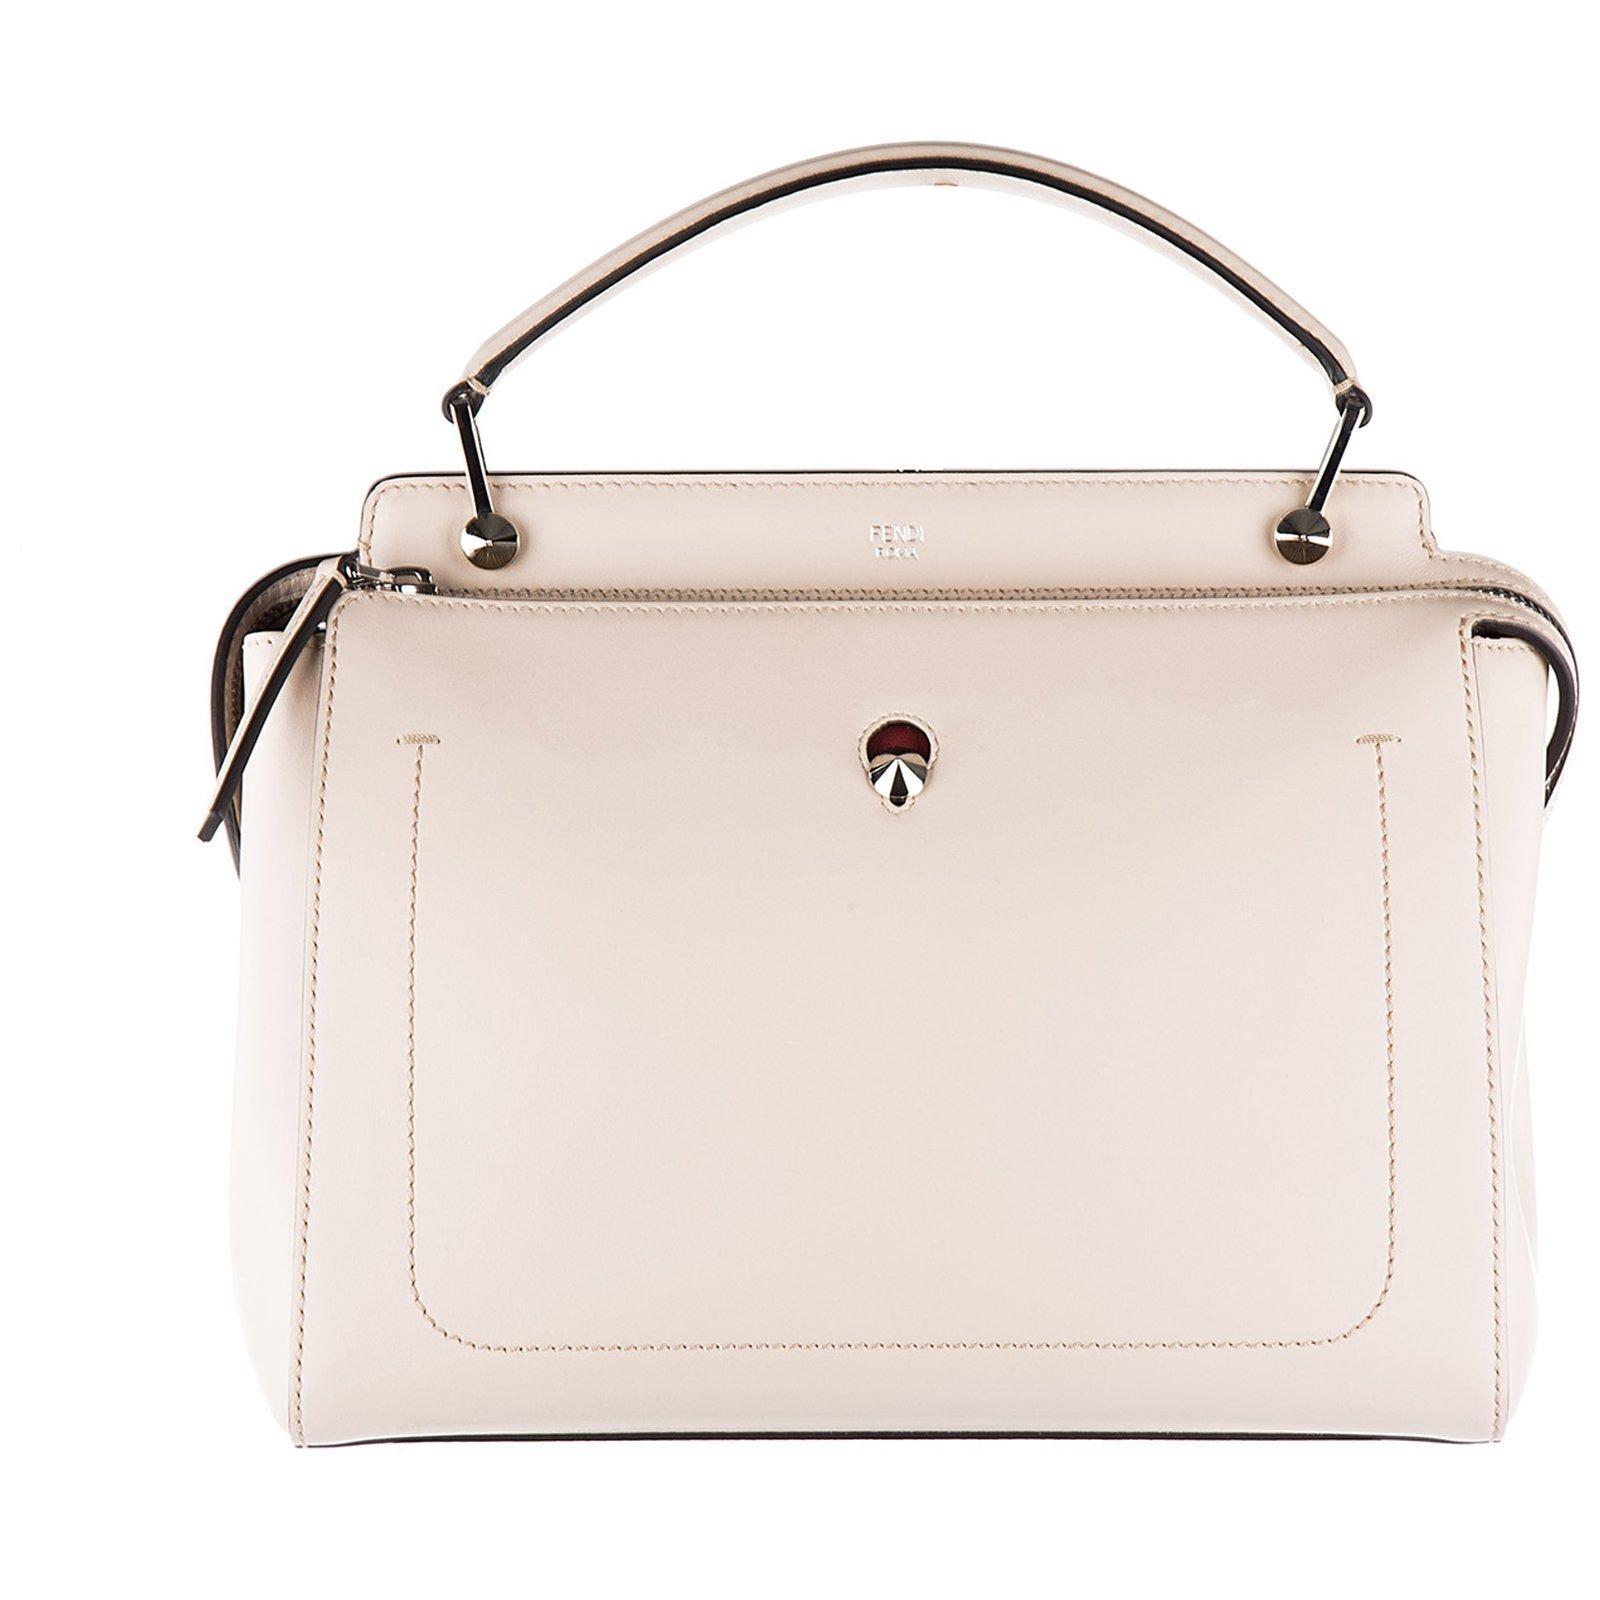 9b08c27455b8 Fendi Dotcom Tote Bag In Pink